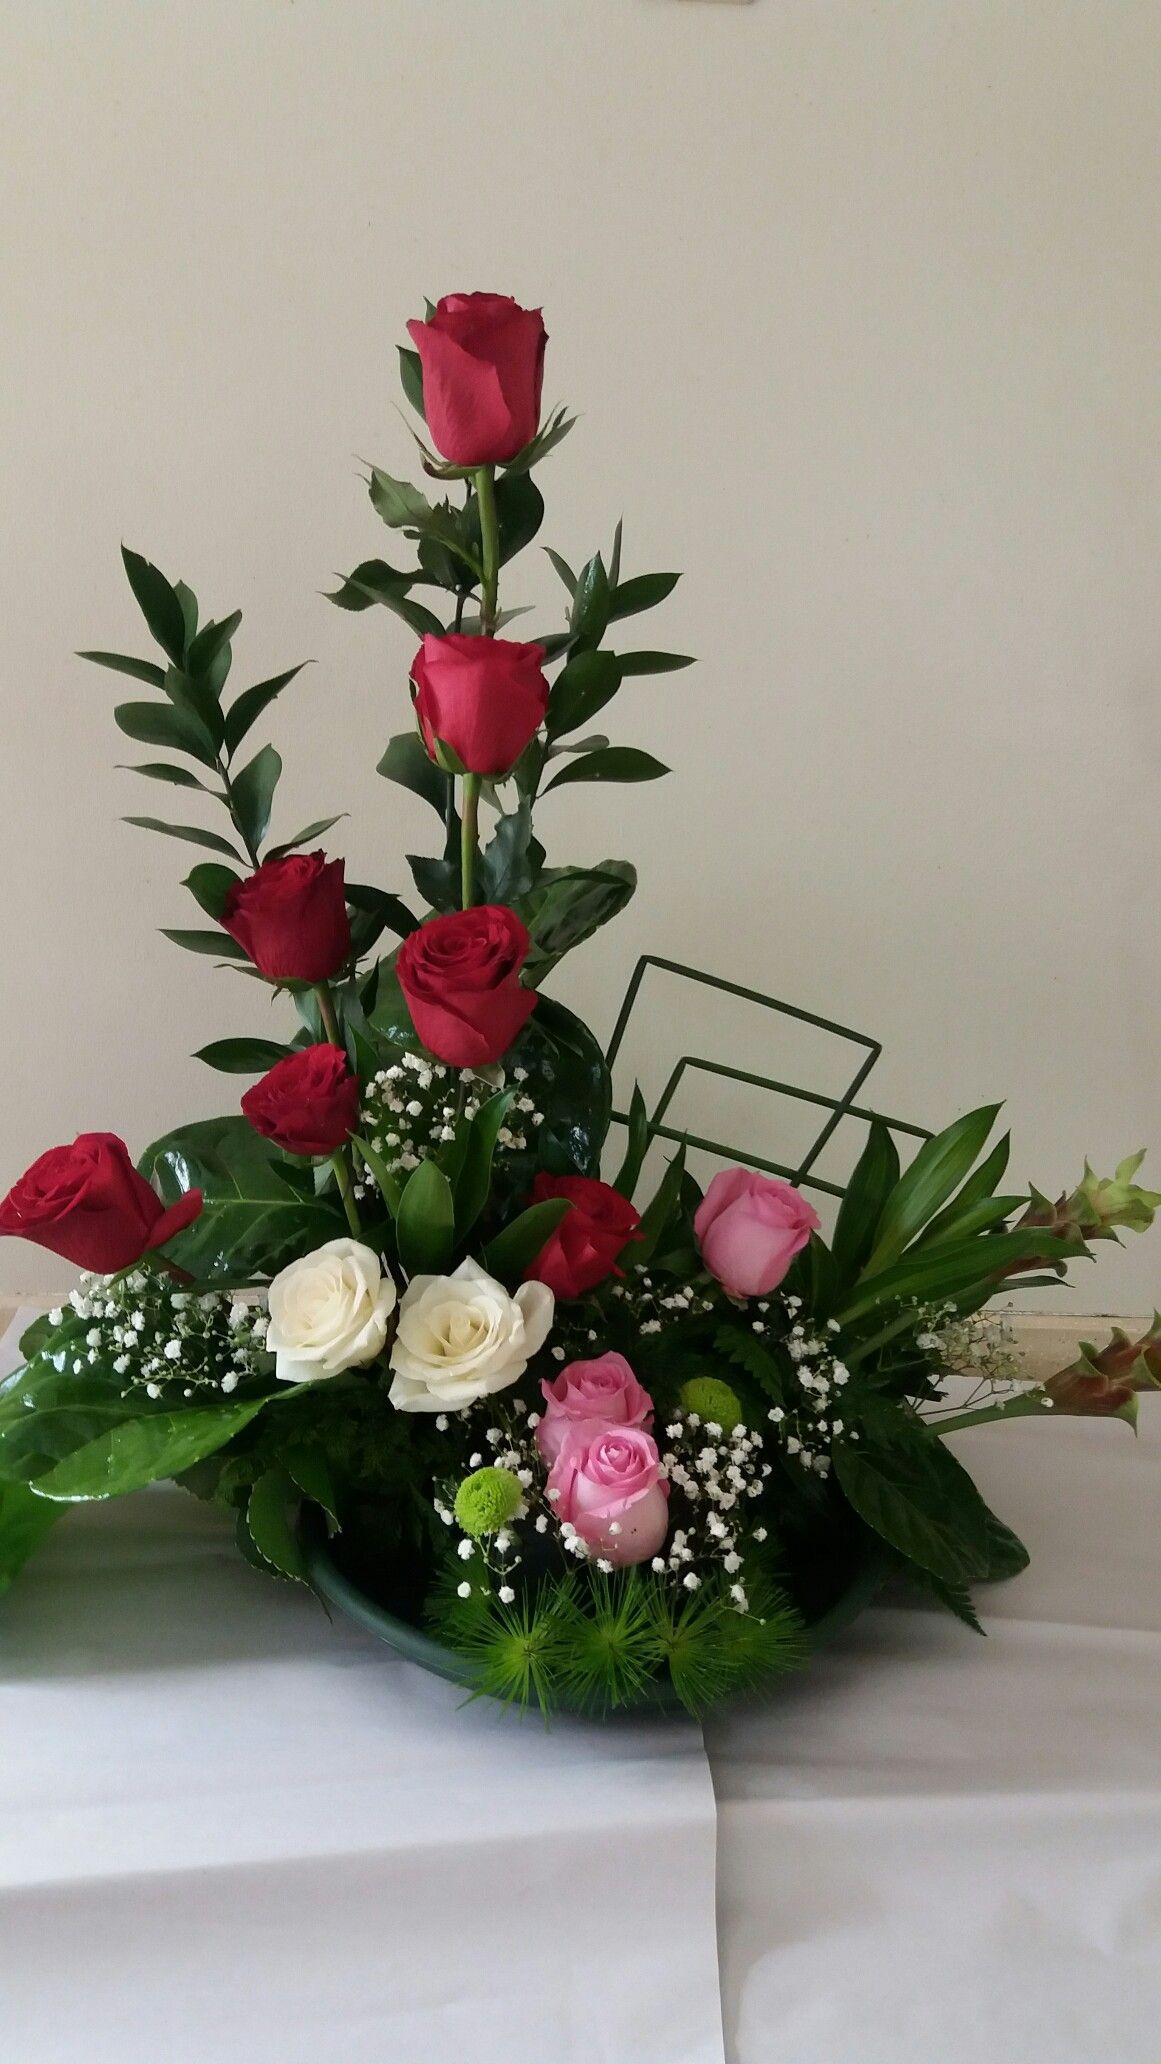 Arreglos De Rosas Arreglos De Rosas Arreglos Florales